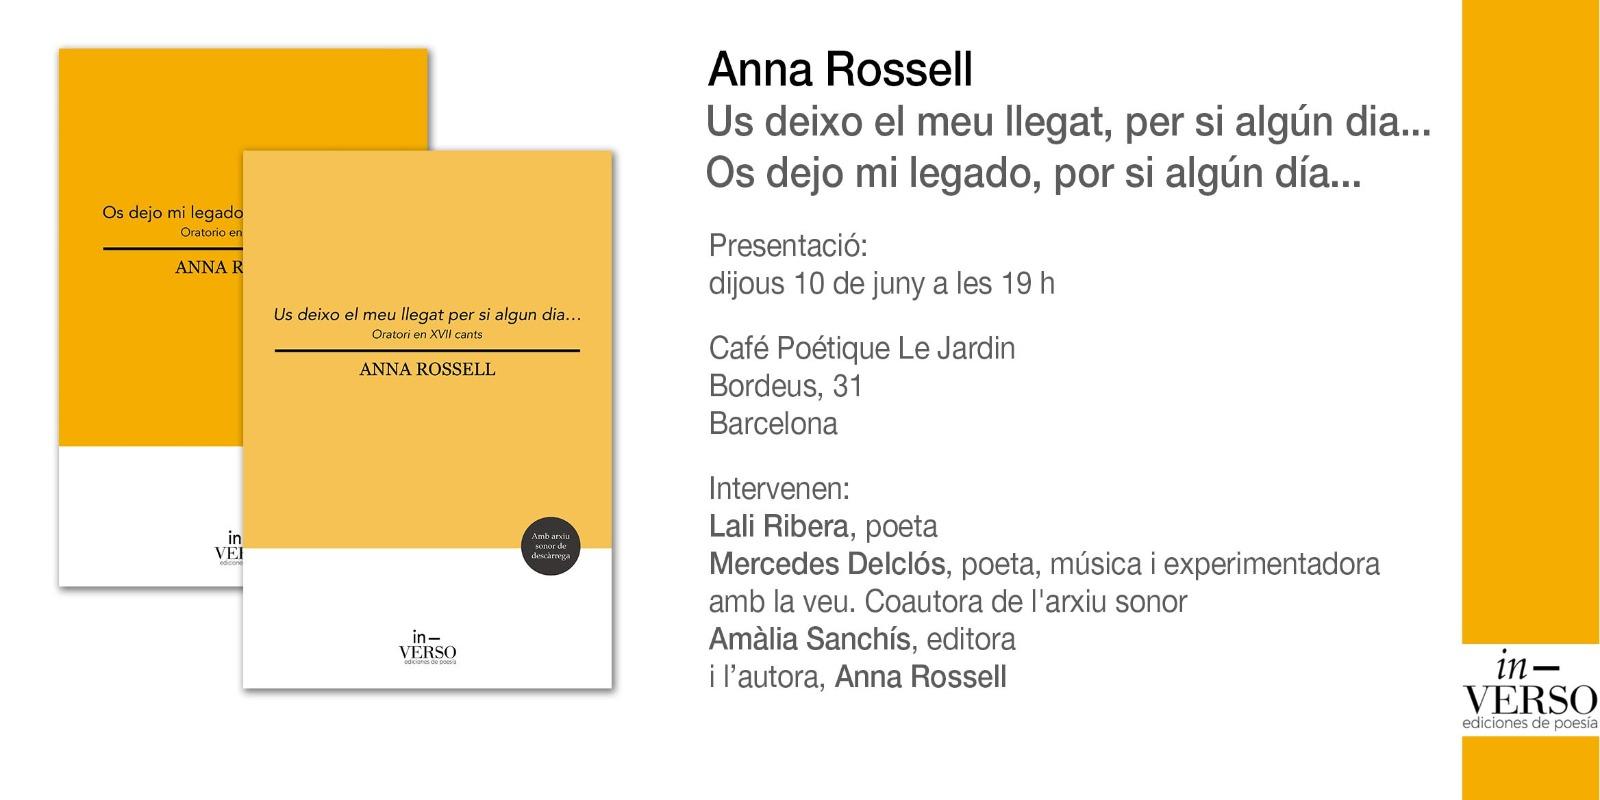 Cartel Presentación de «Os dejo mi legado por si algún día... (Oratorio en XVII cantos), de Anna Rossell